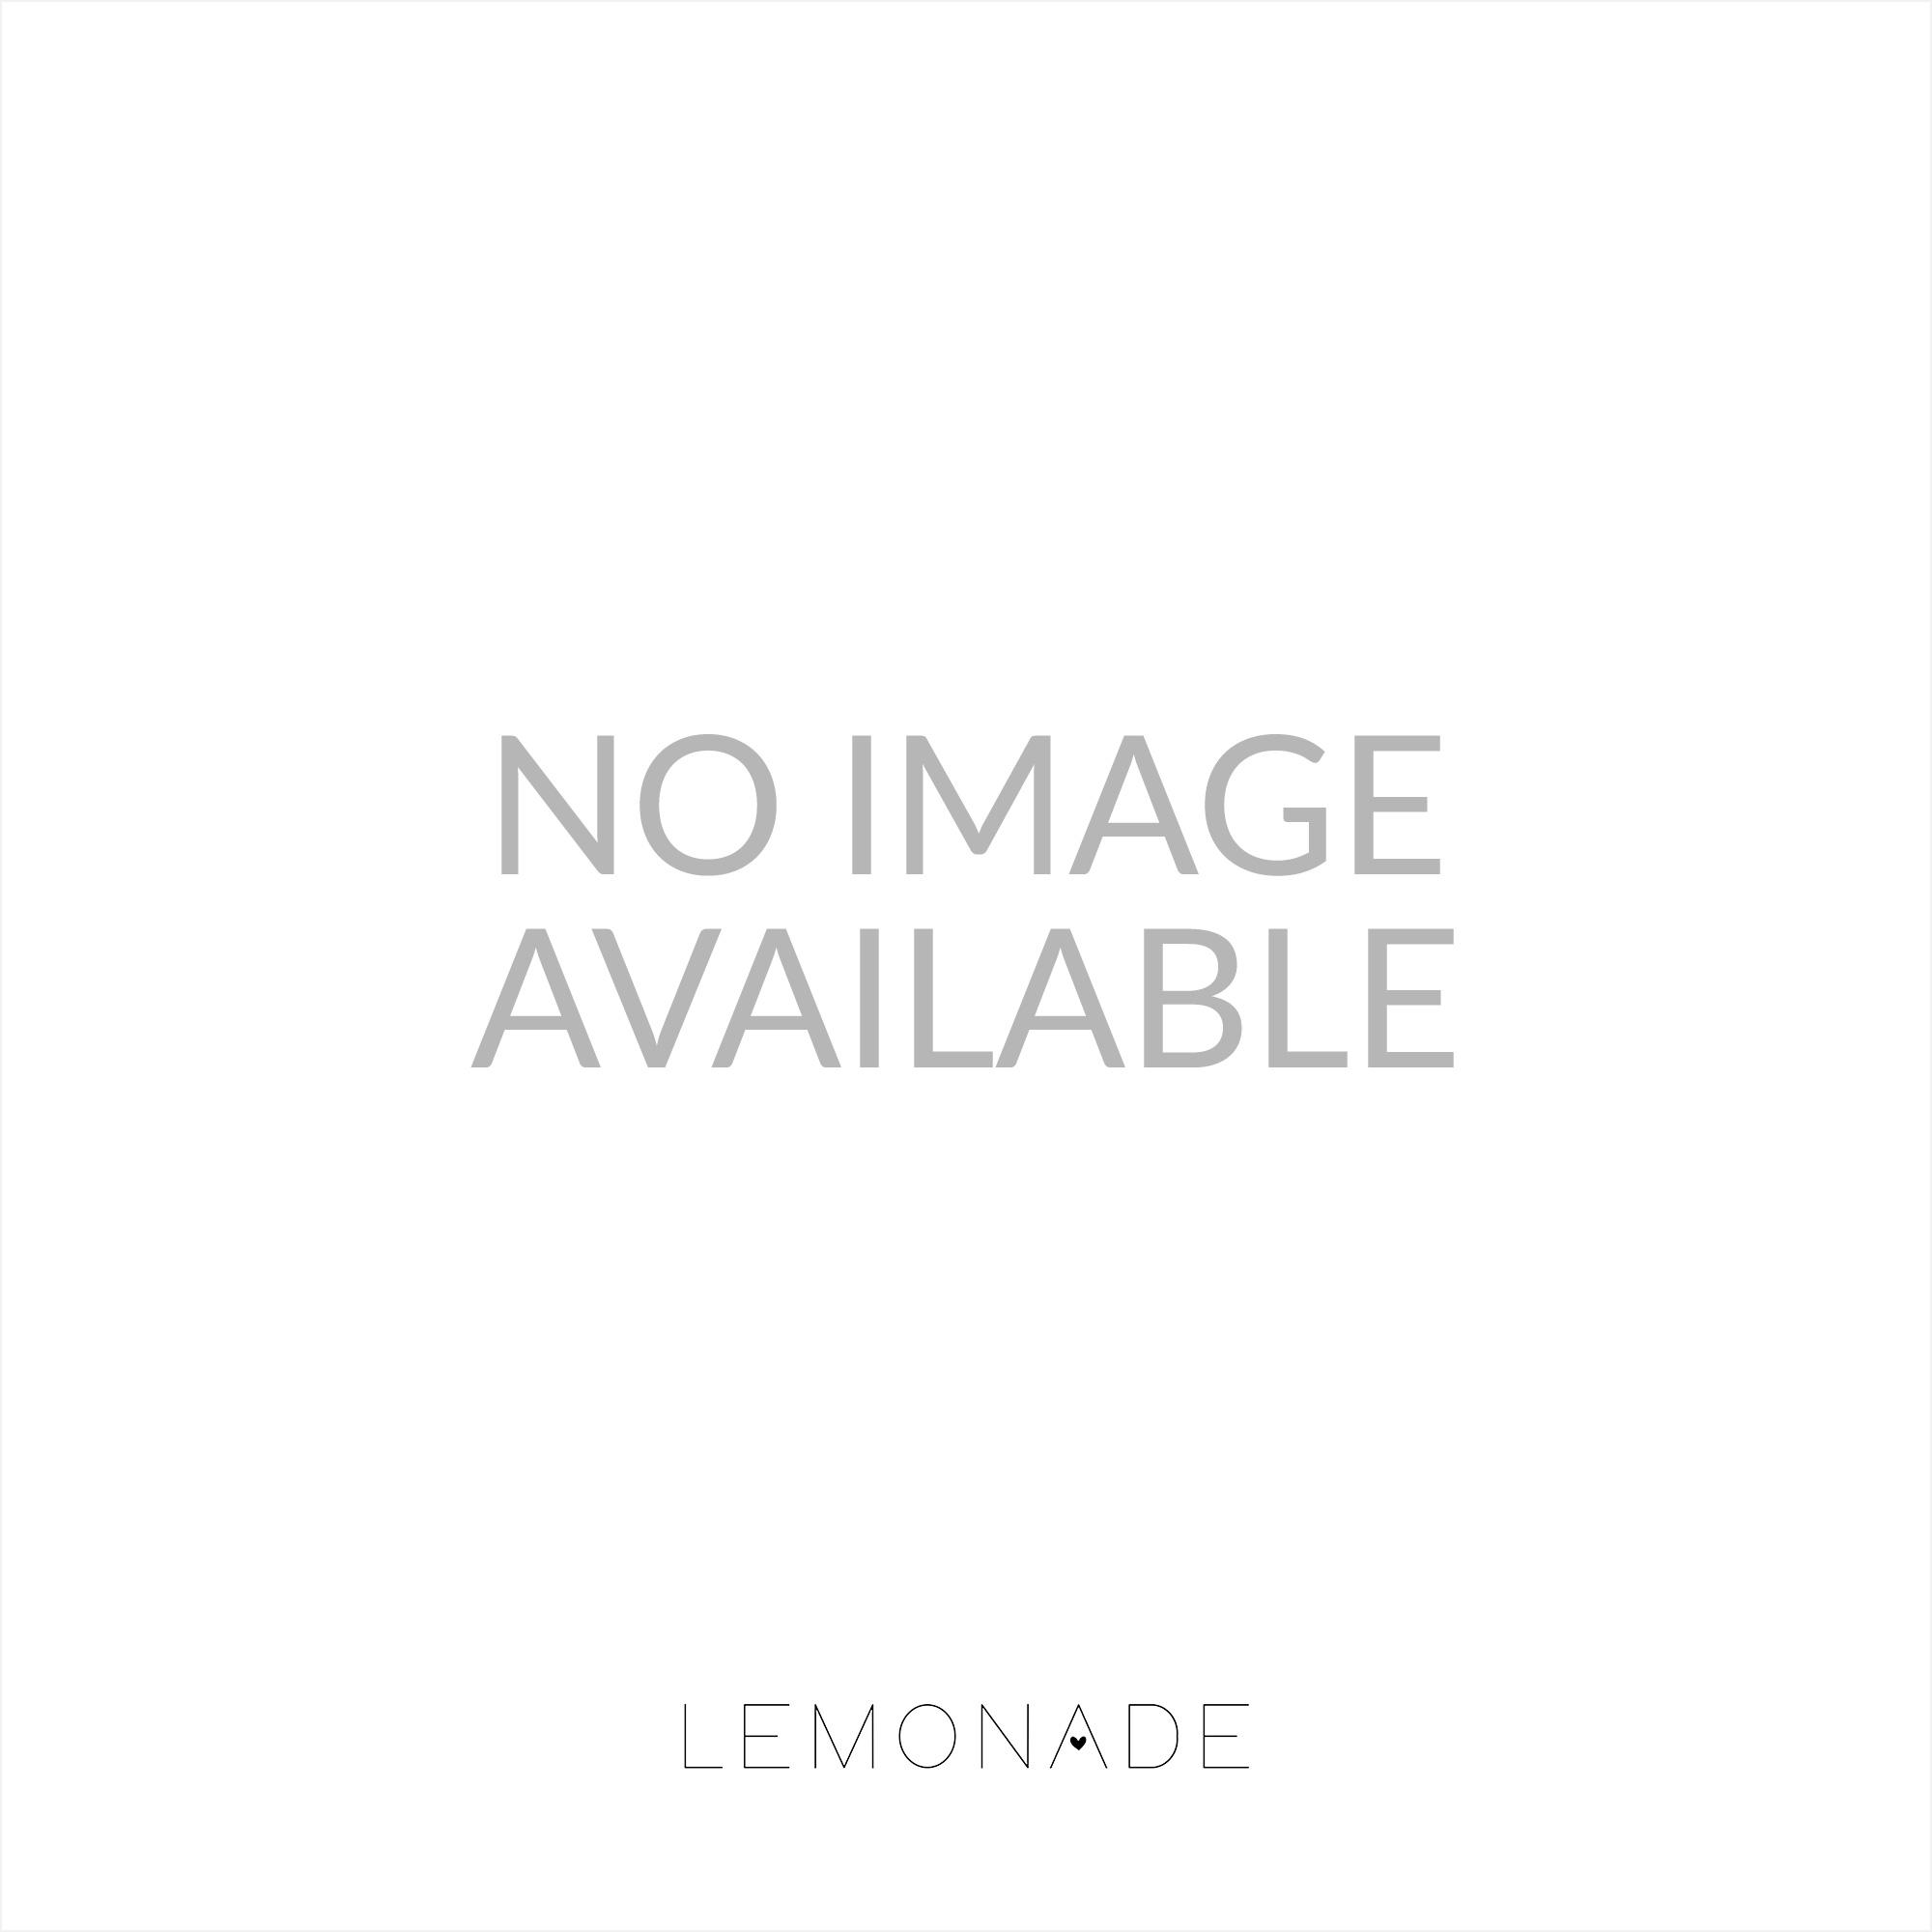 5b737d9bca78 Lemonade Swarovski Crystal Jelly Bow Flip Flop Silver